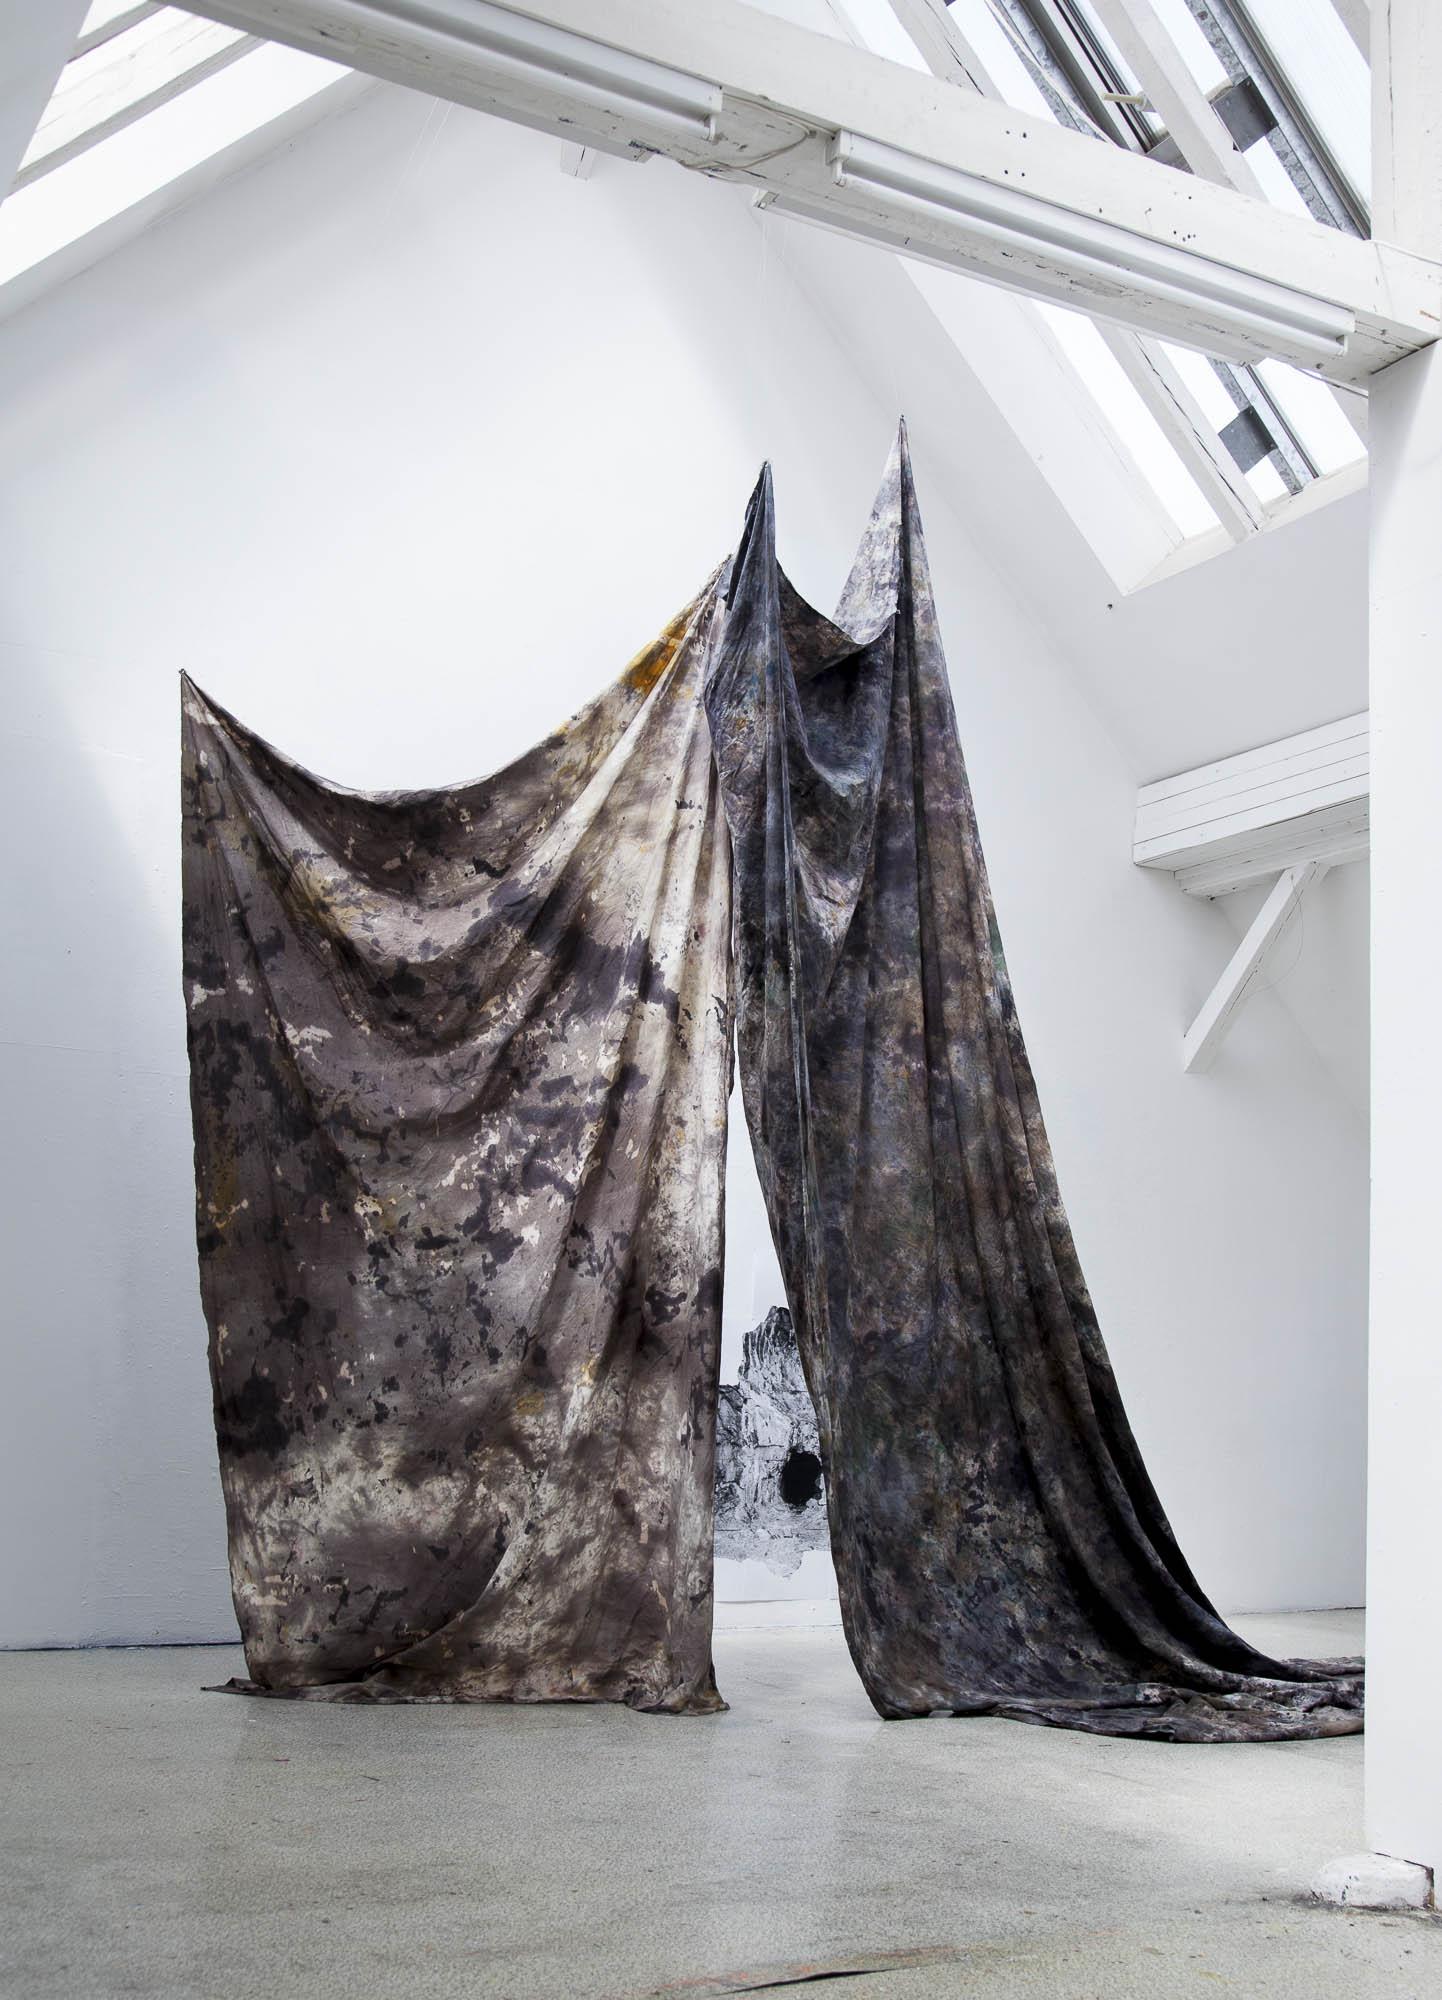 © Katharina Gahlert, HEL, 2019